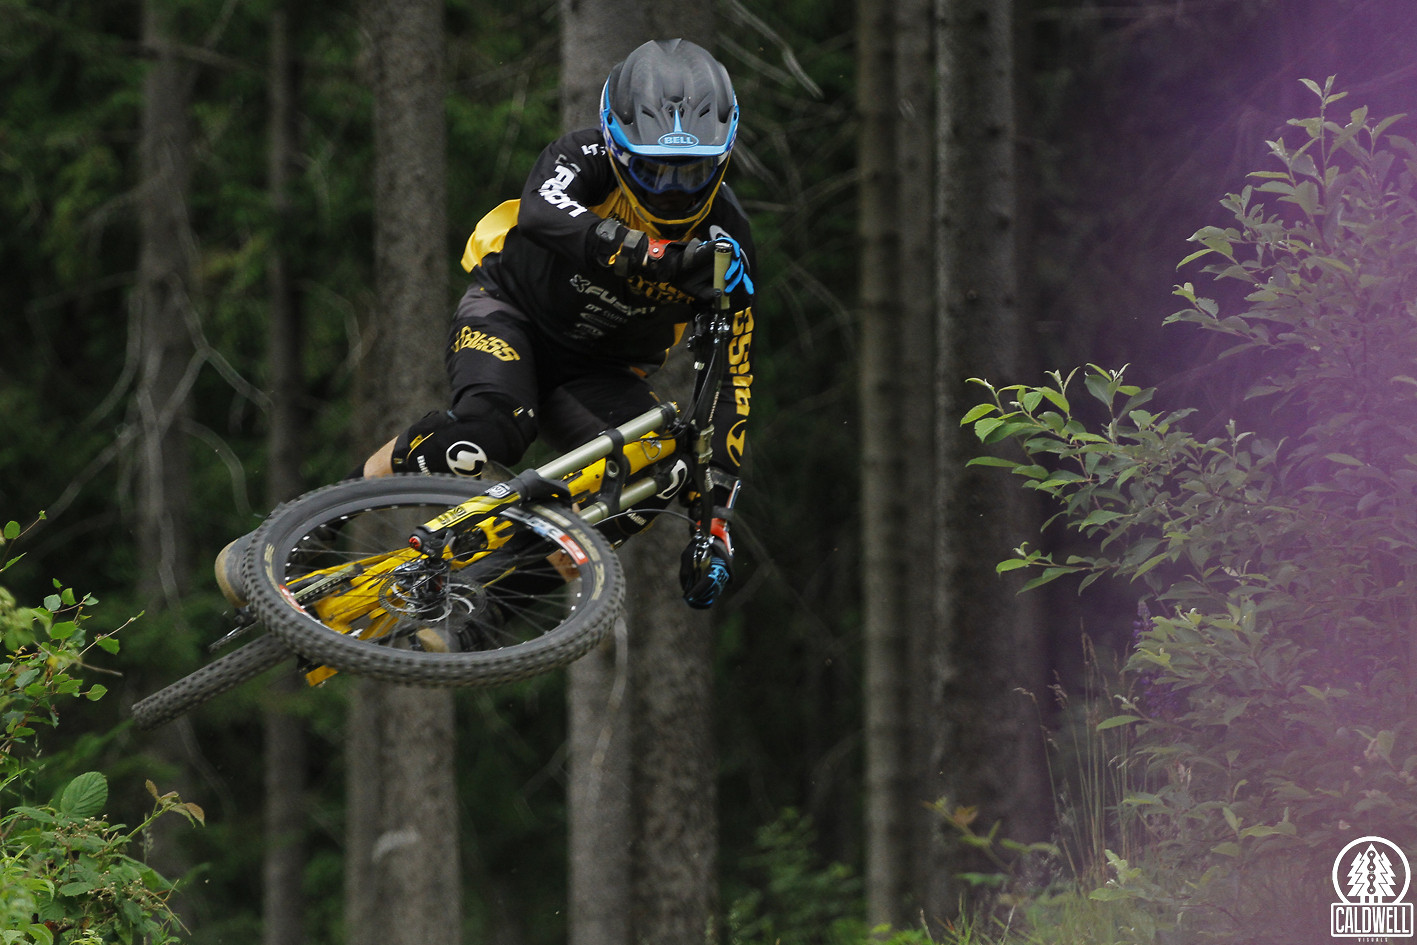 Scrubbin' - CaldwellVisuals - Mountain Biking Pictures - Vital MTB